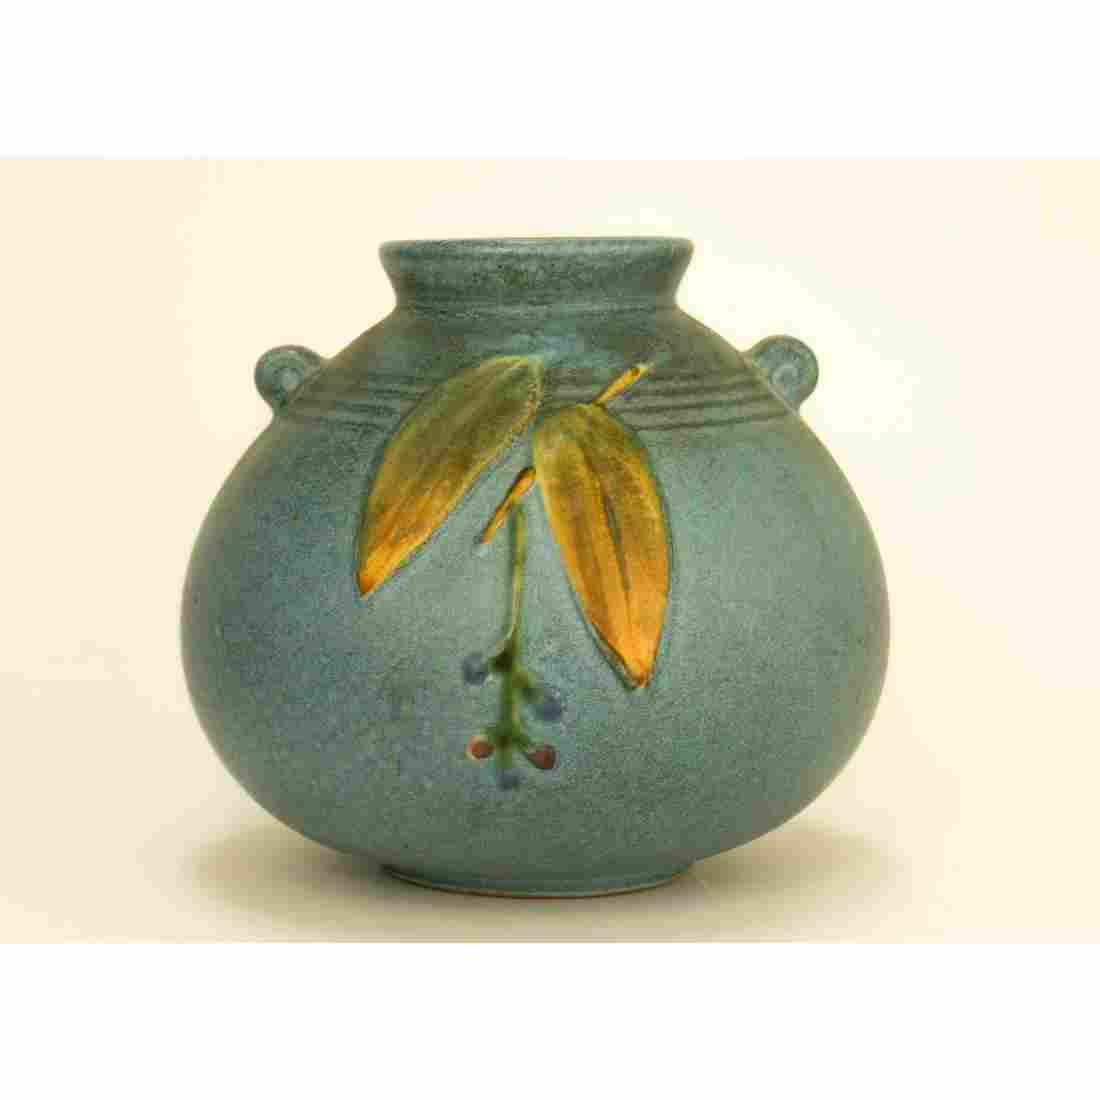 Antique Weller Pottery Cornish Vase